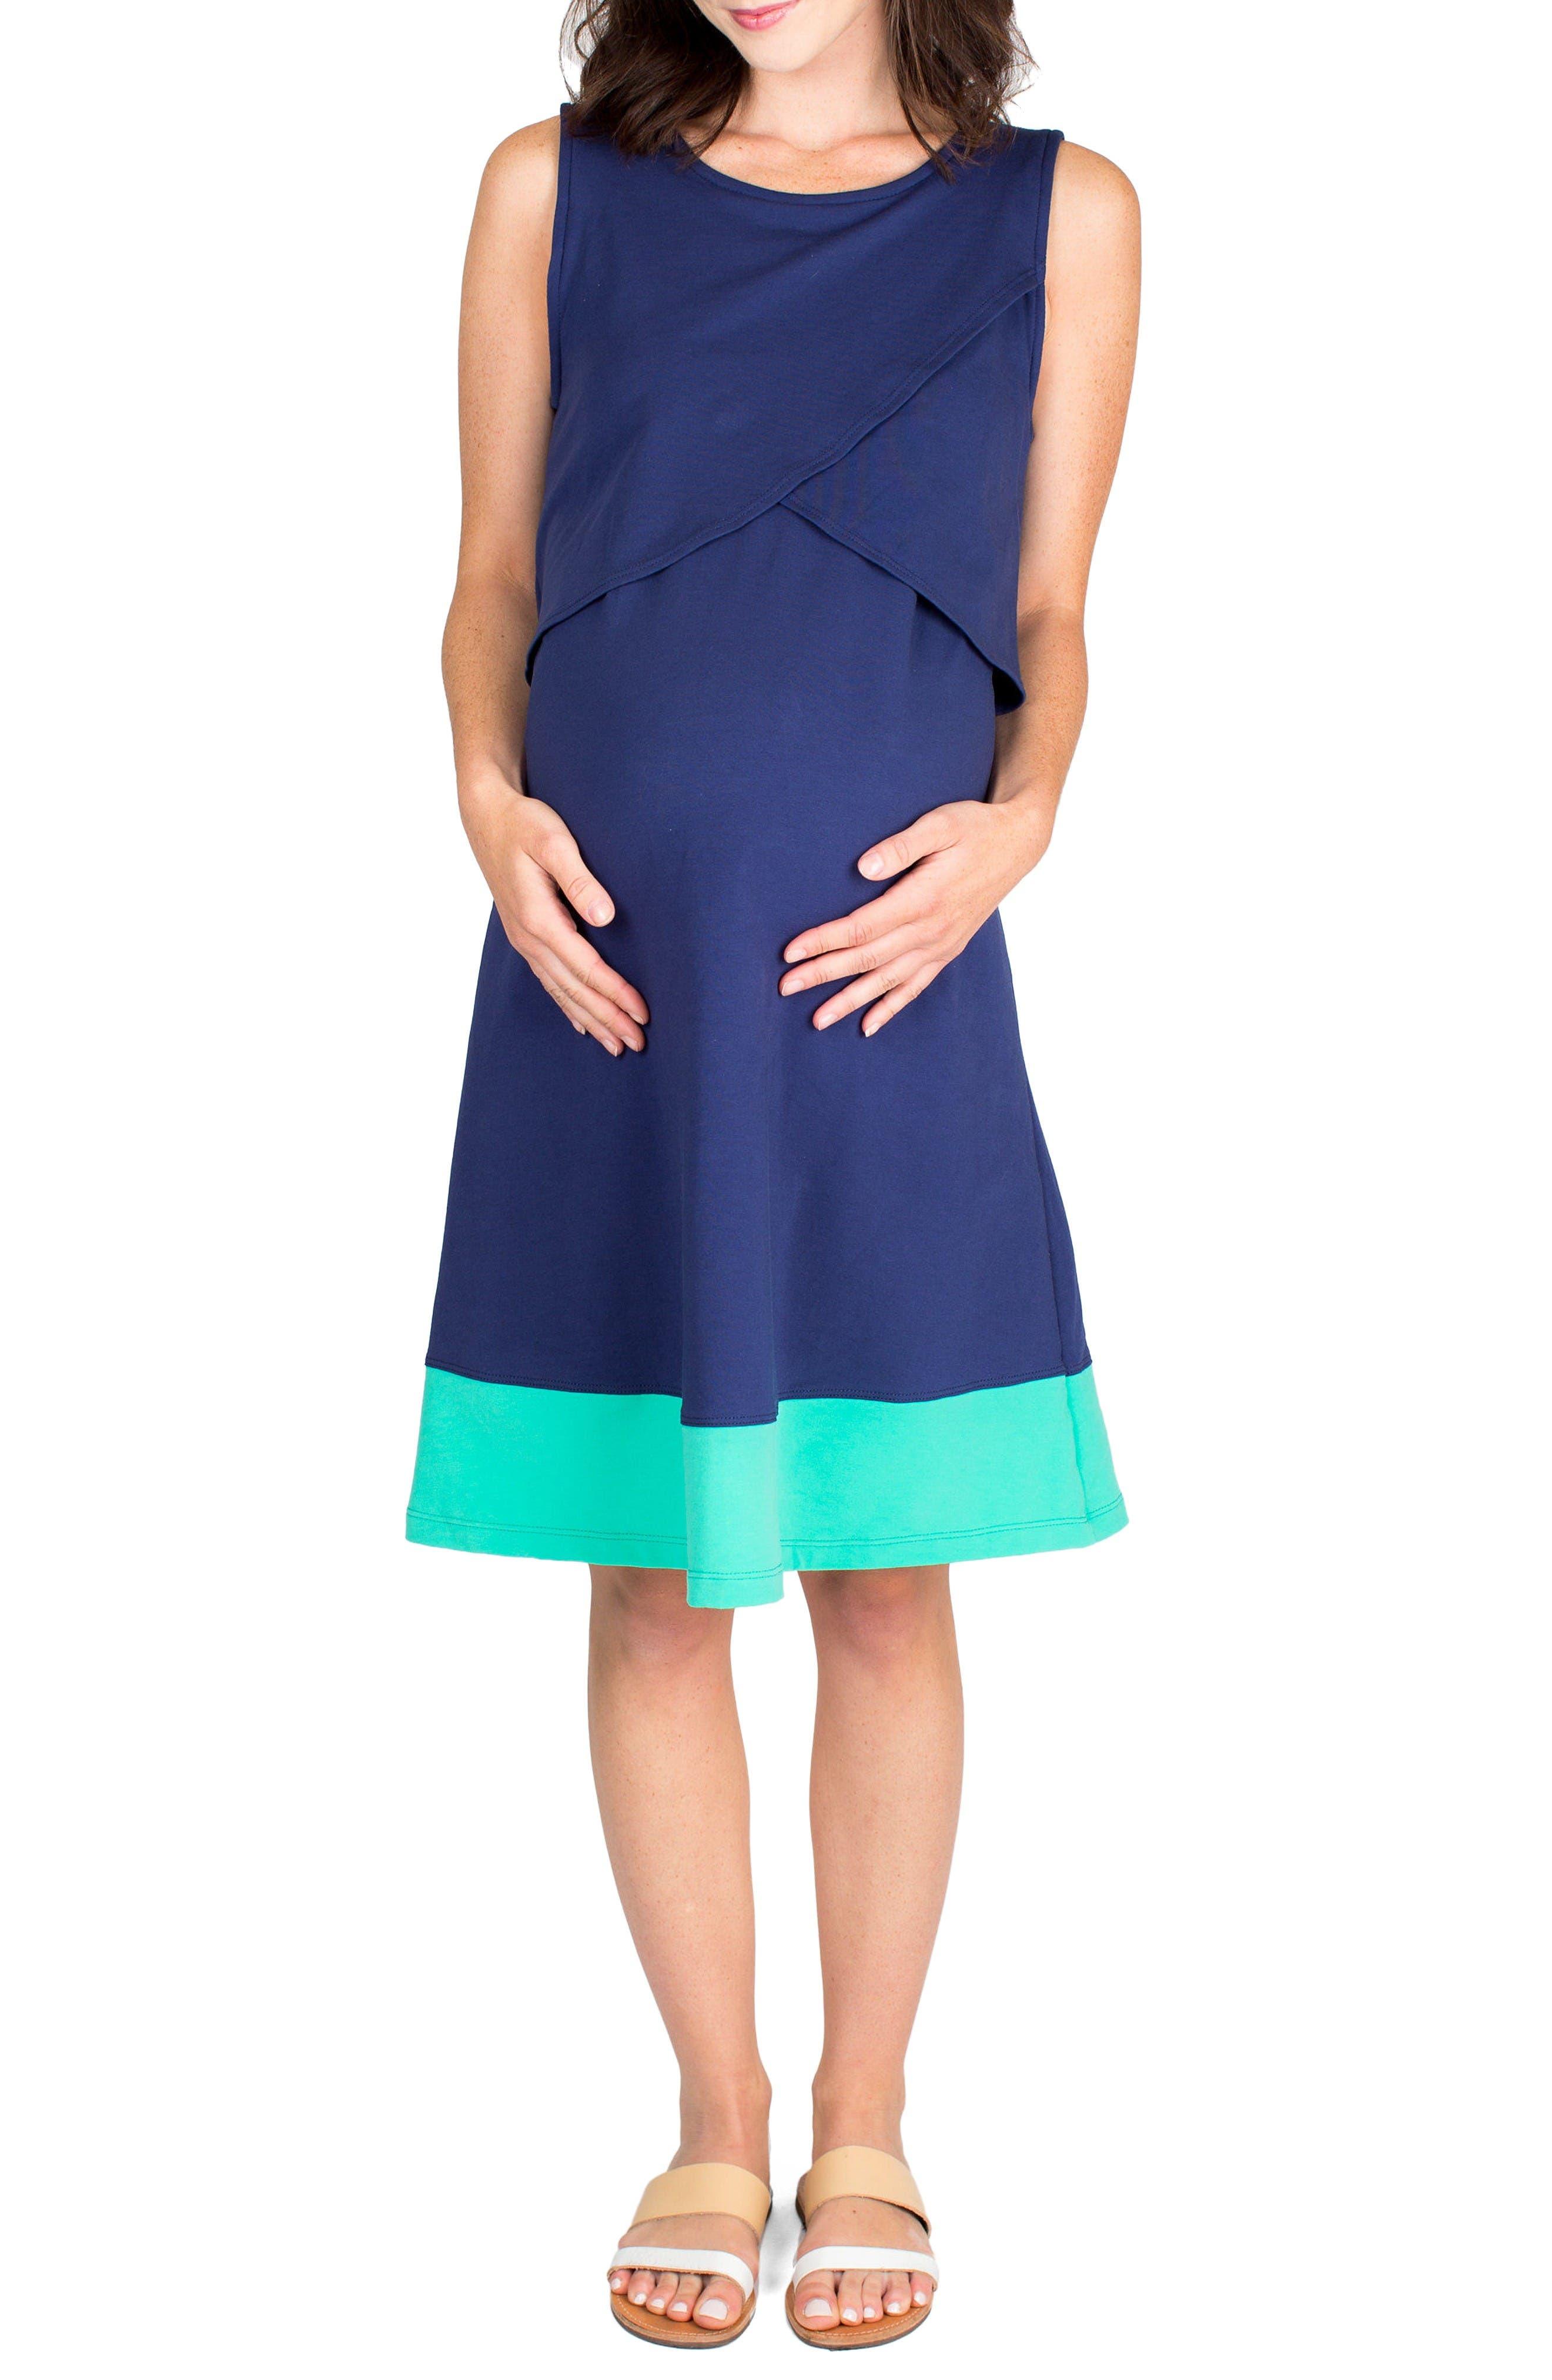 Main Image - Nom Maternity Sophia Maternity/Nursing Dress